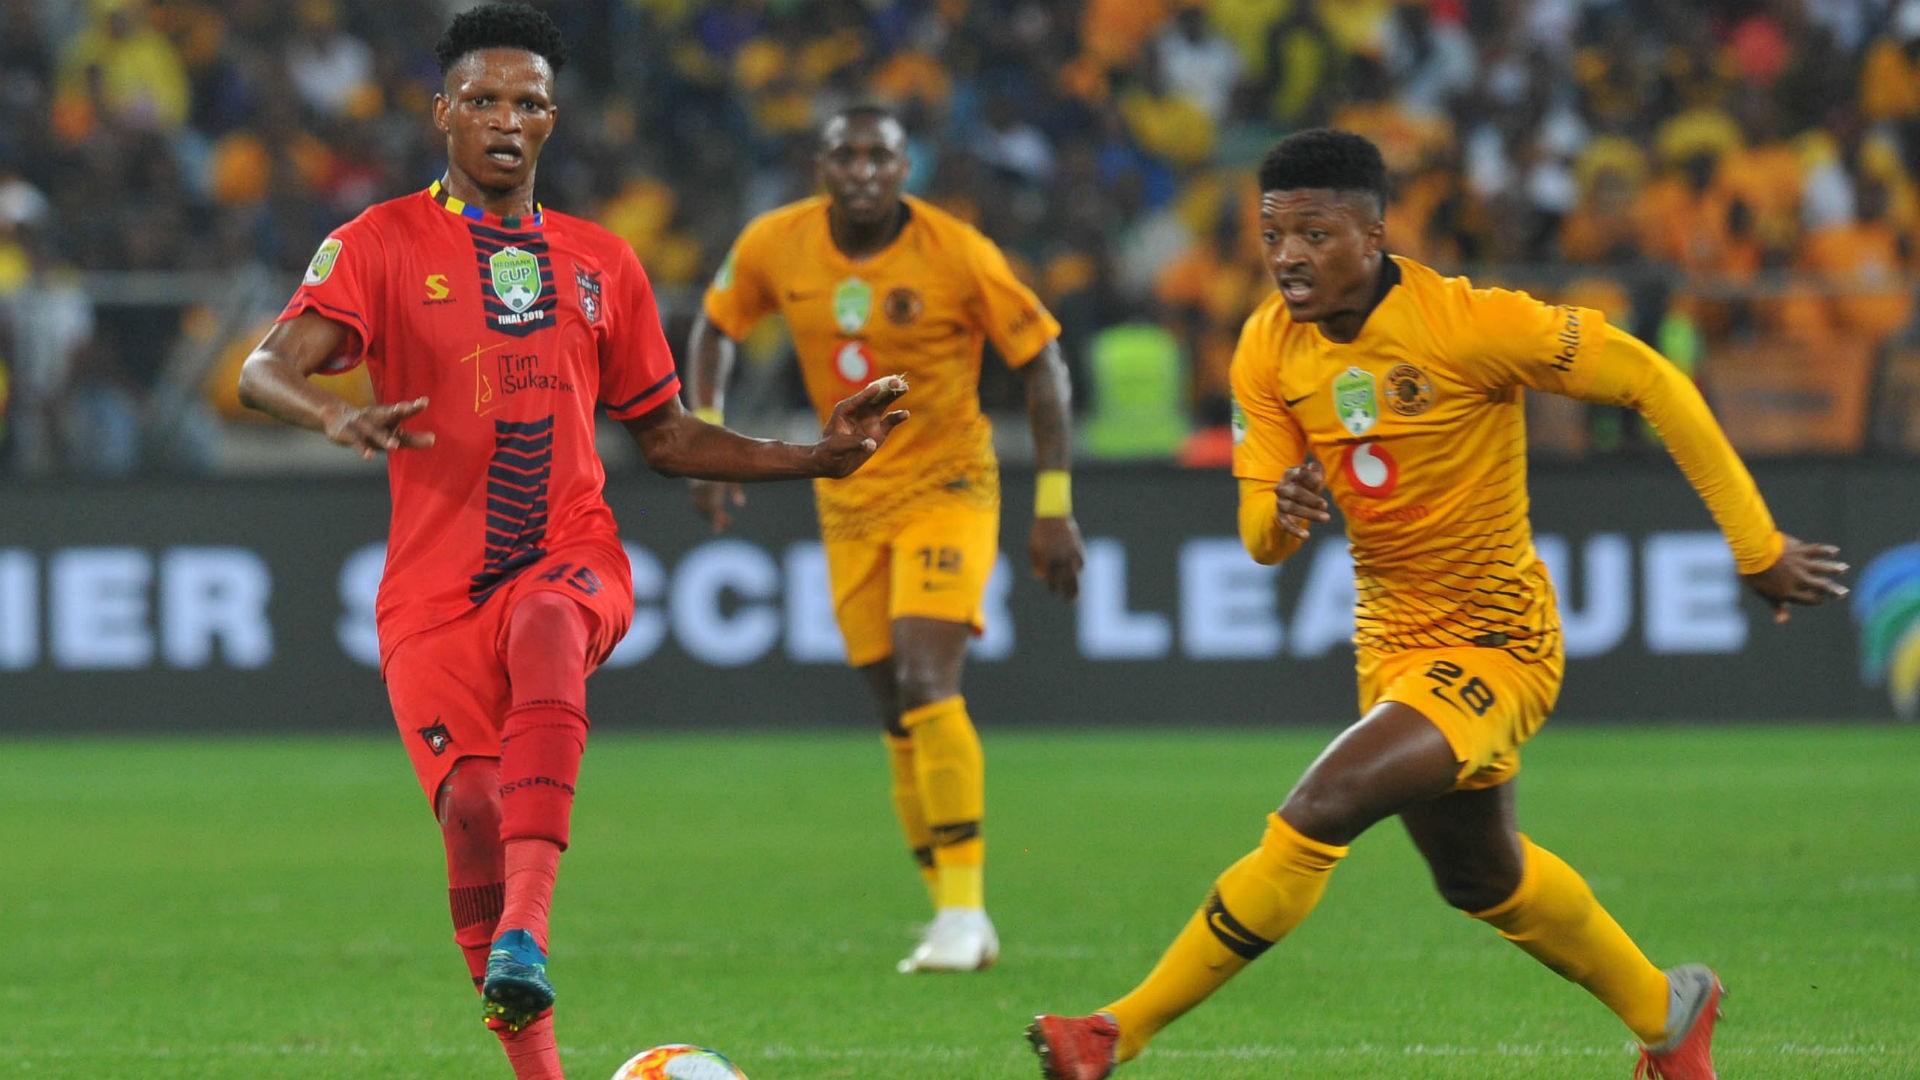 Austin Dube, TS Galaxy & Dumisani Zuma, Kaizer Chiefs, May 2019